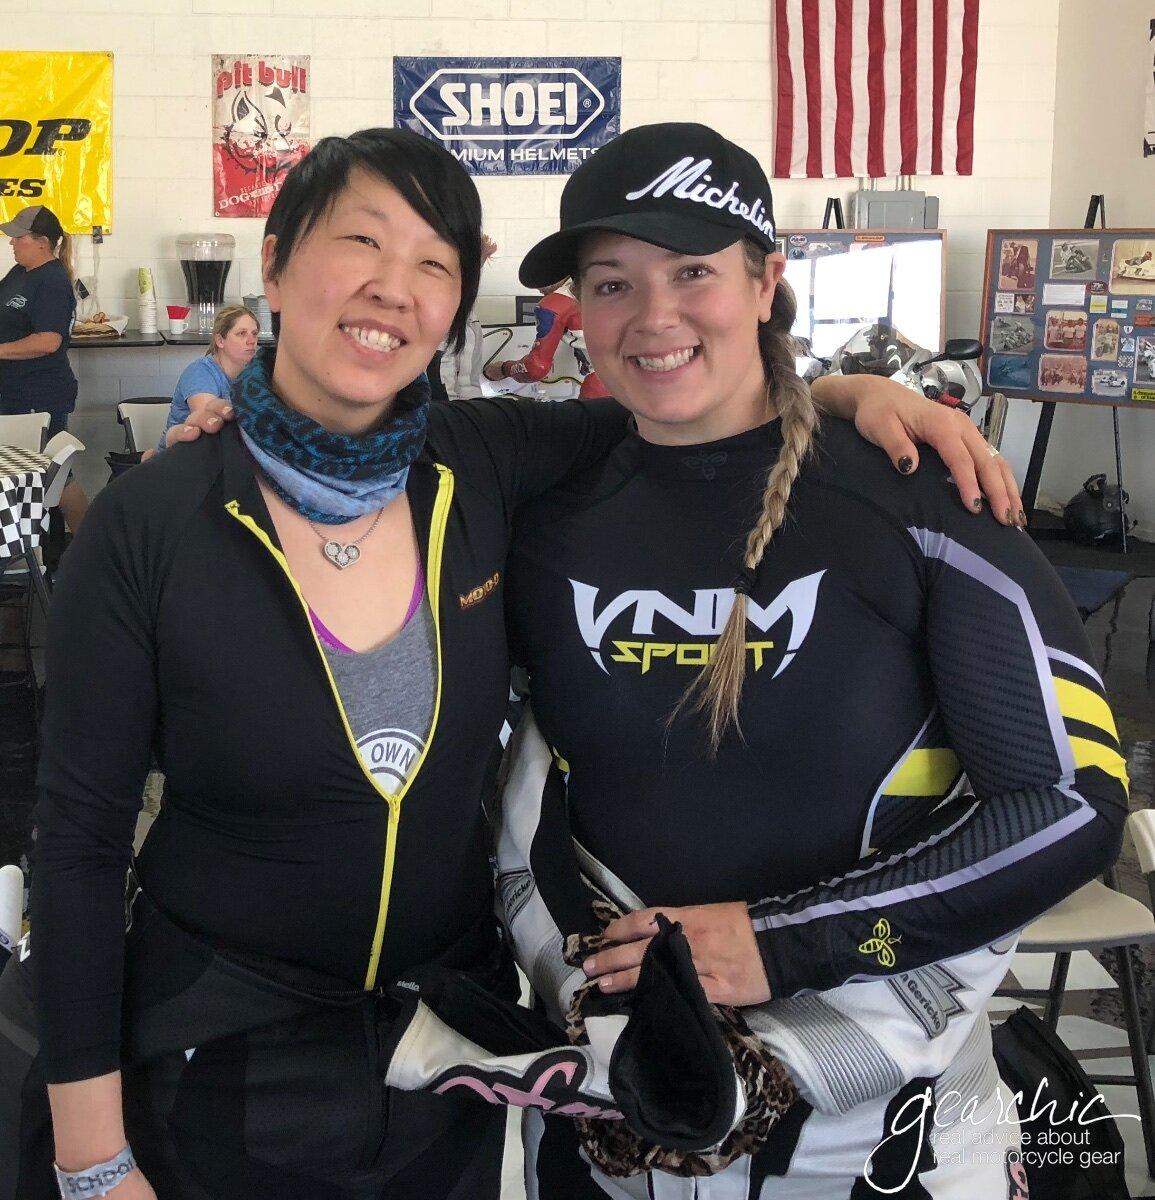 Joanne Donn  (left, GearChic.com) and  Brittany Morrow  (Rockthegear.org, Brittanymorrow.com)